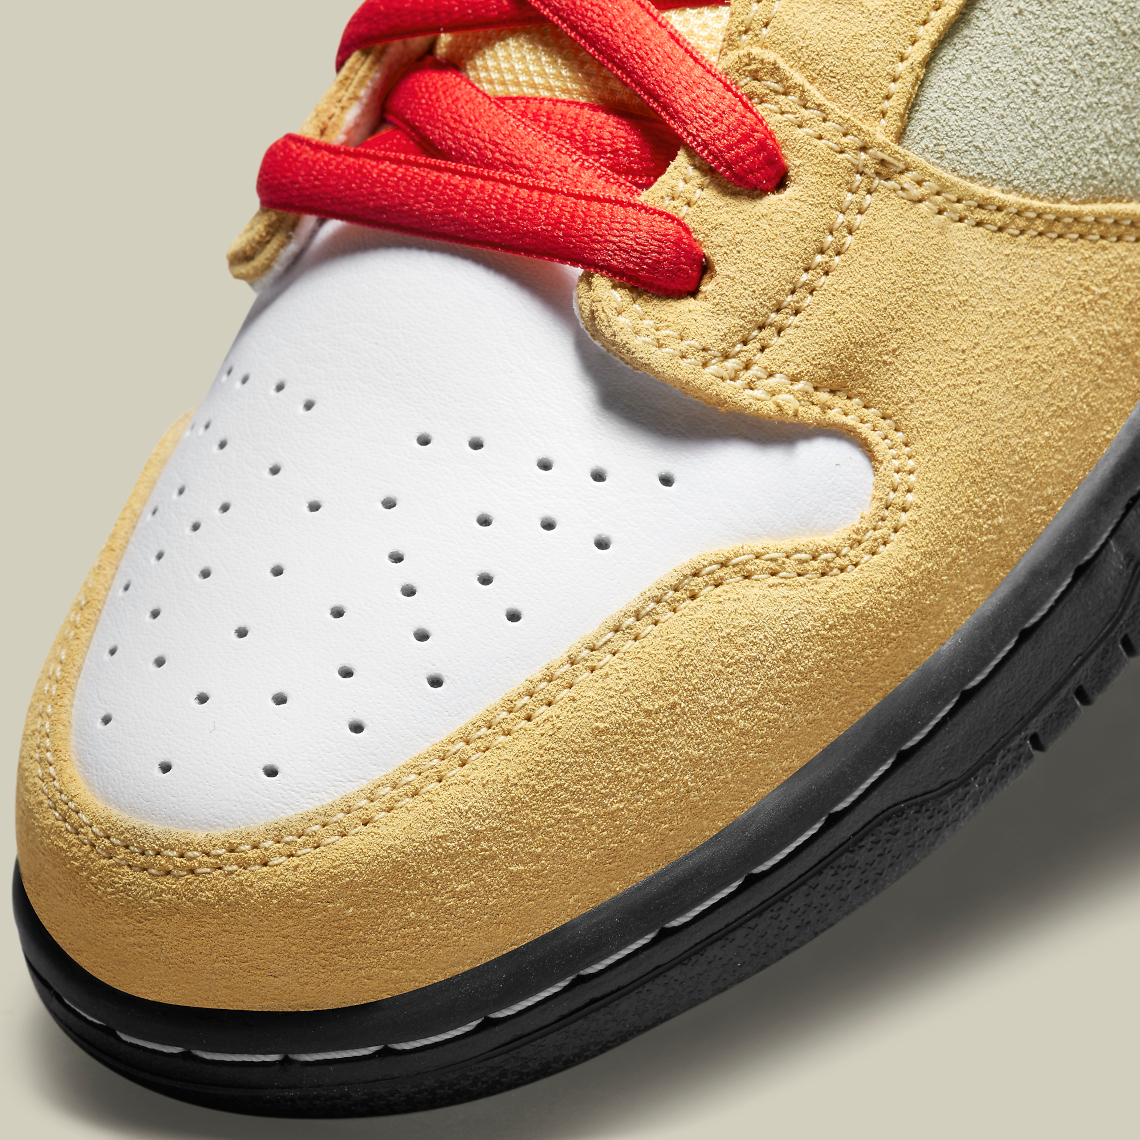 Nike-SB-Dunk-High-CZ2205-700-Color-Skates-CZ2205-700-11.jpg?w=1140